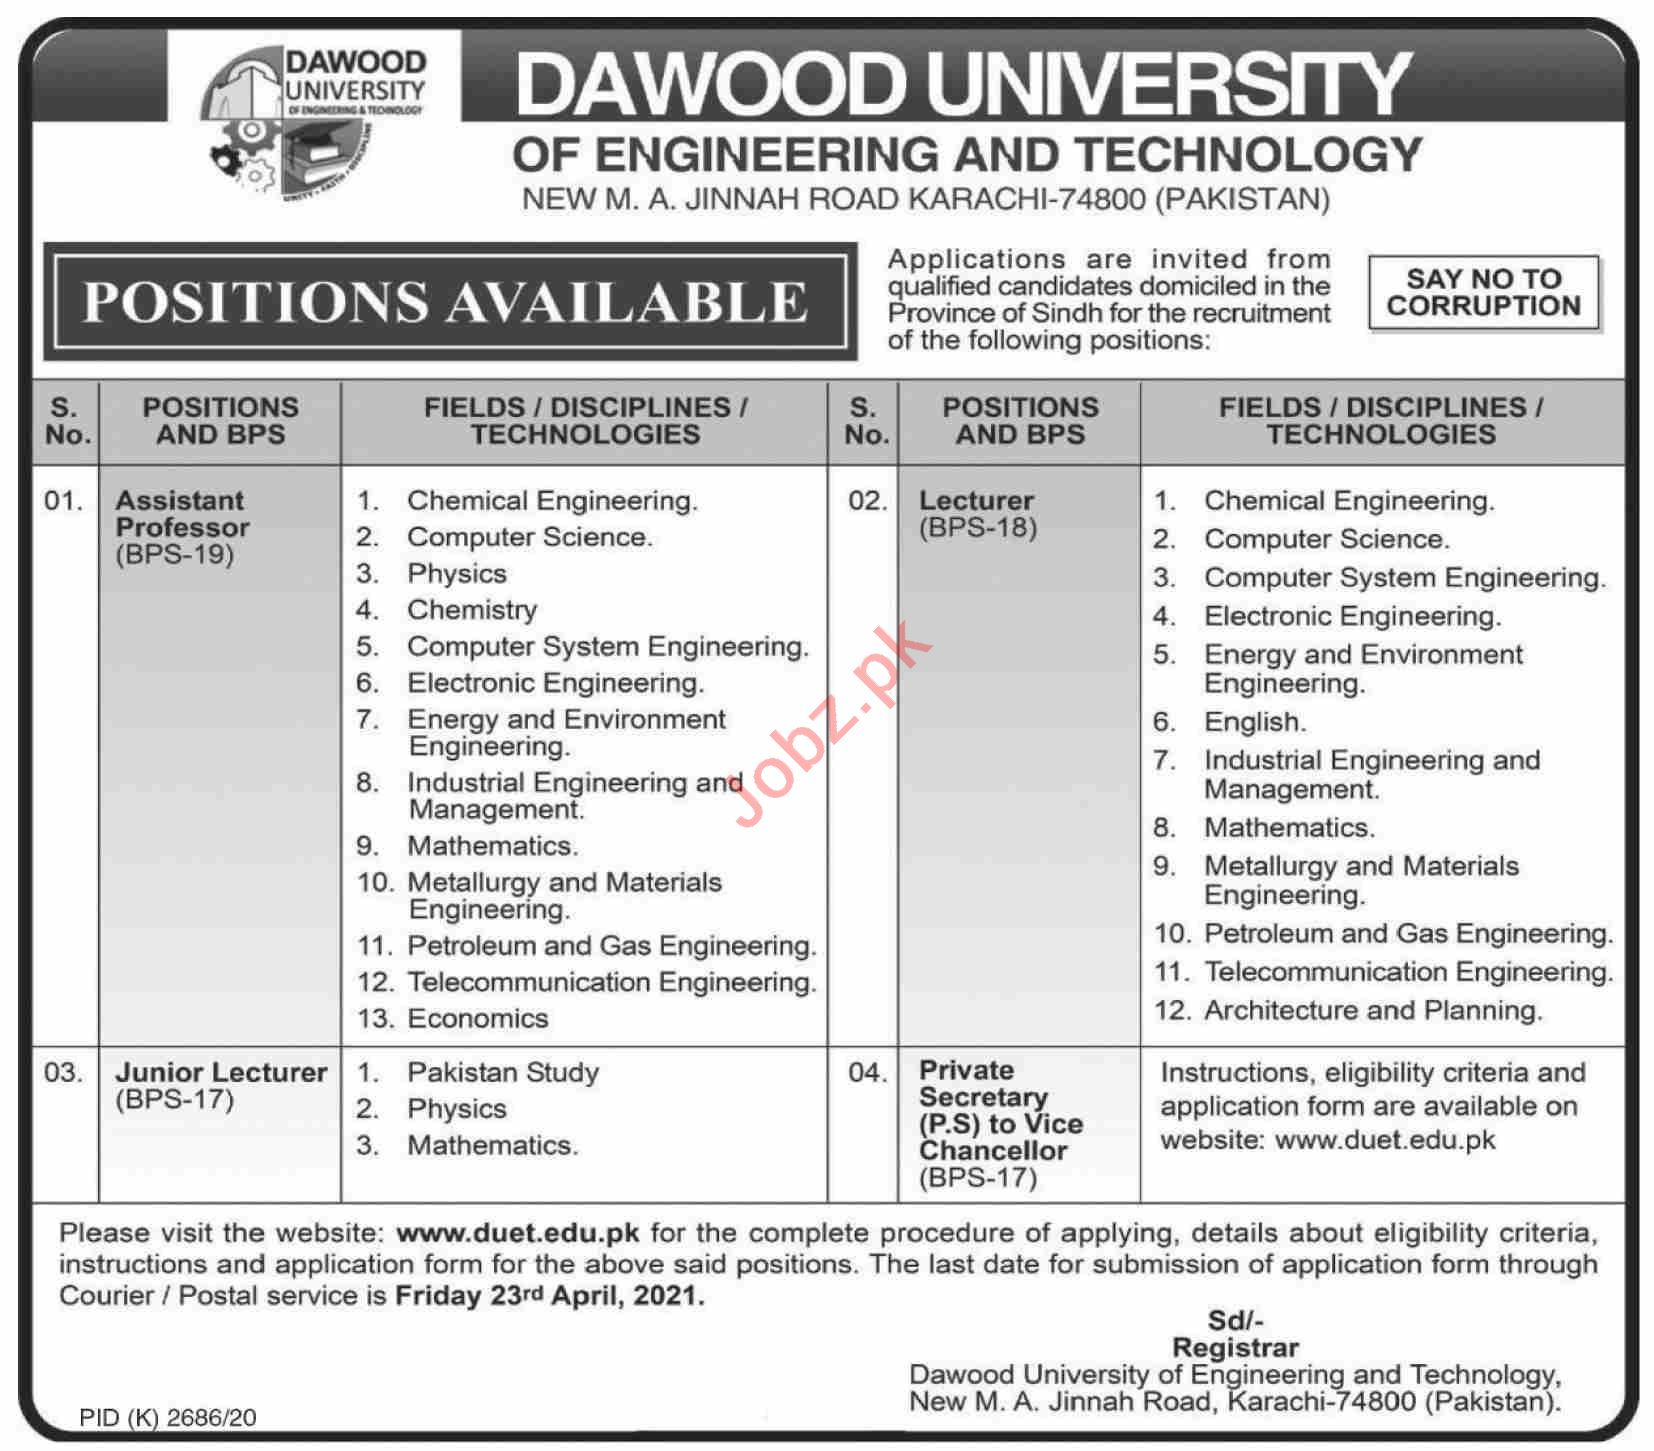 Dawood University DUET Karachi Jobs 2021 for Professors